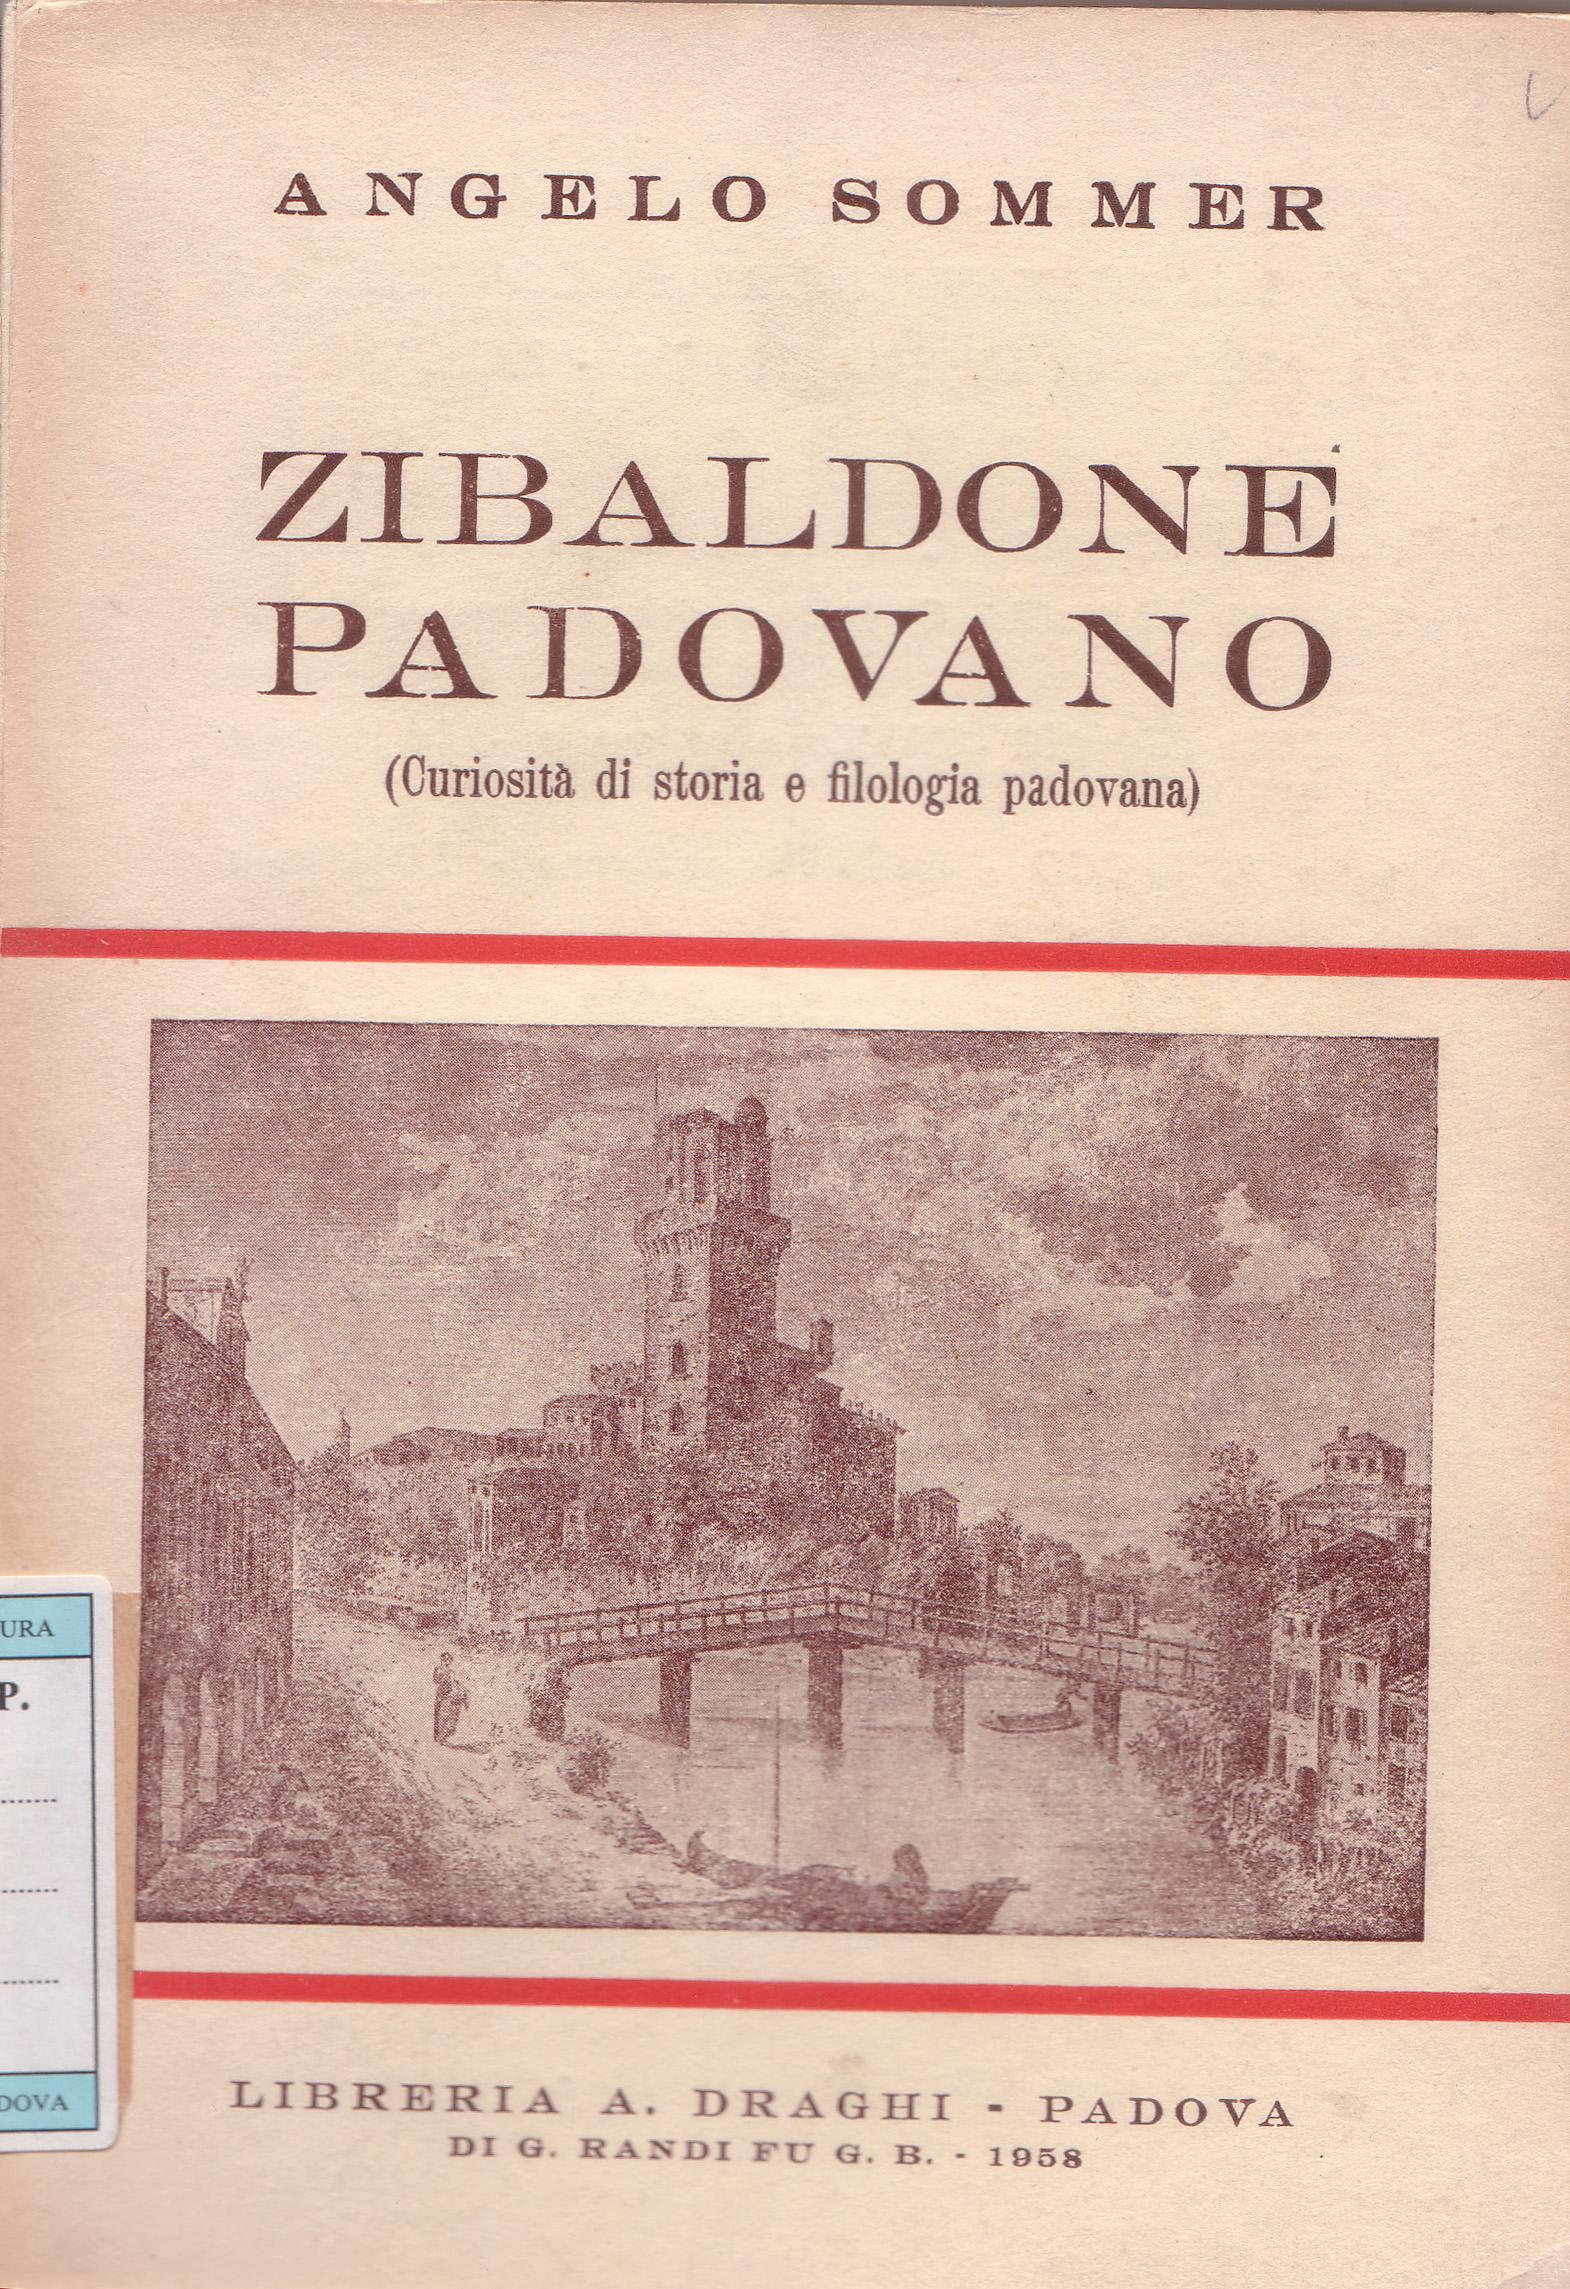 Zibaldone Padovano